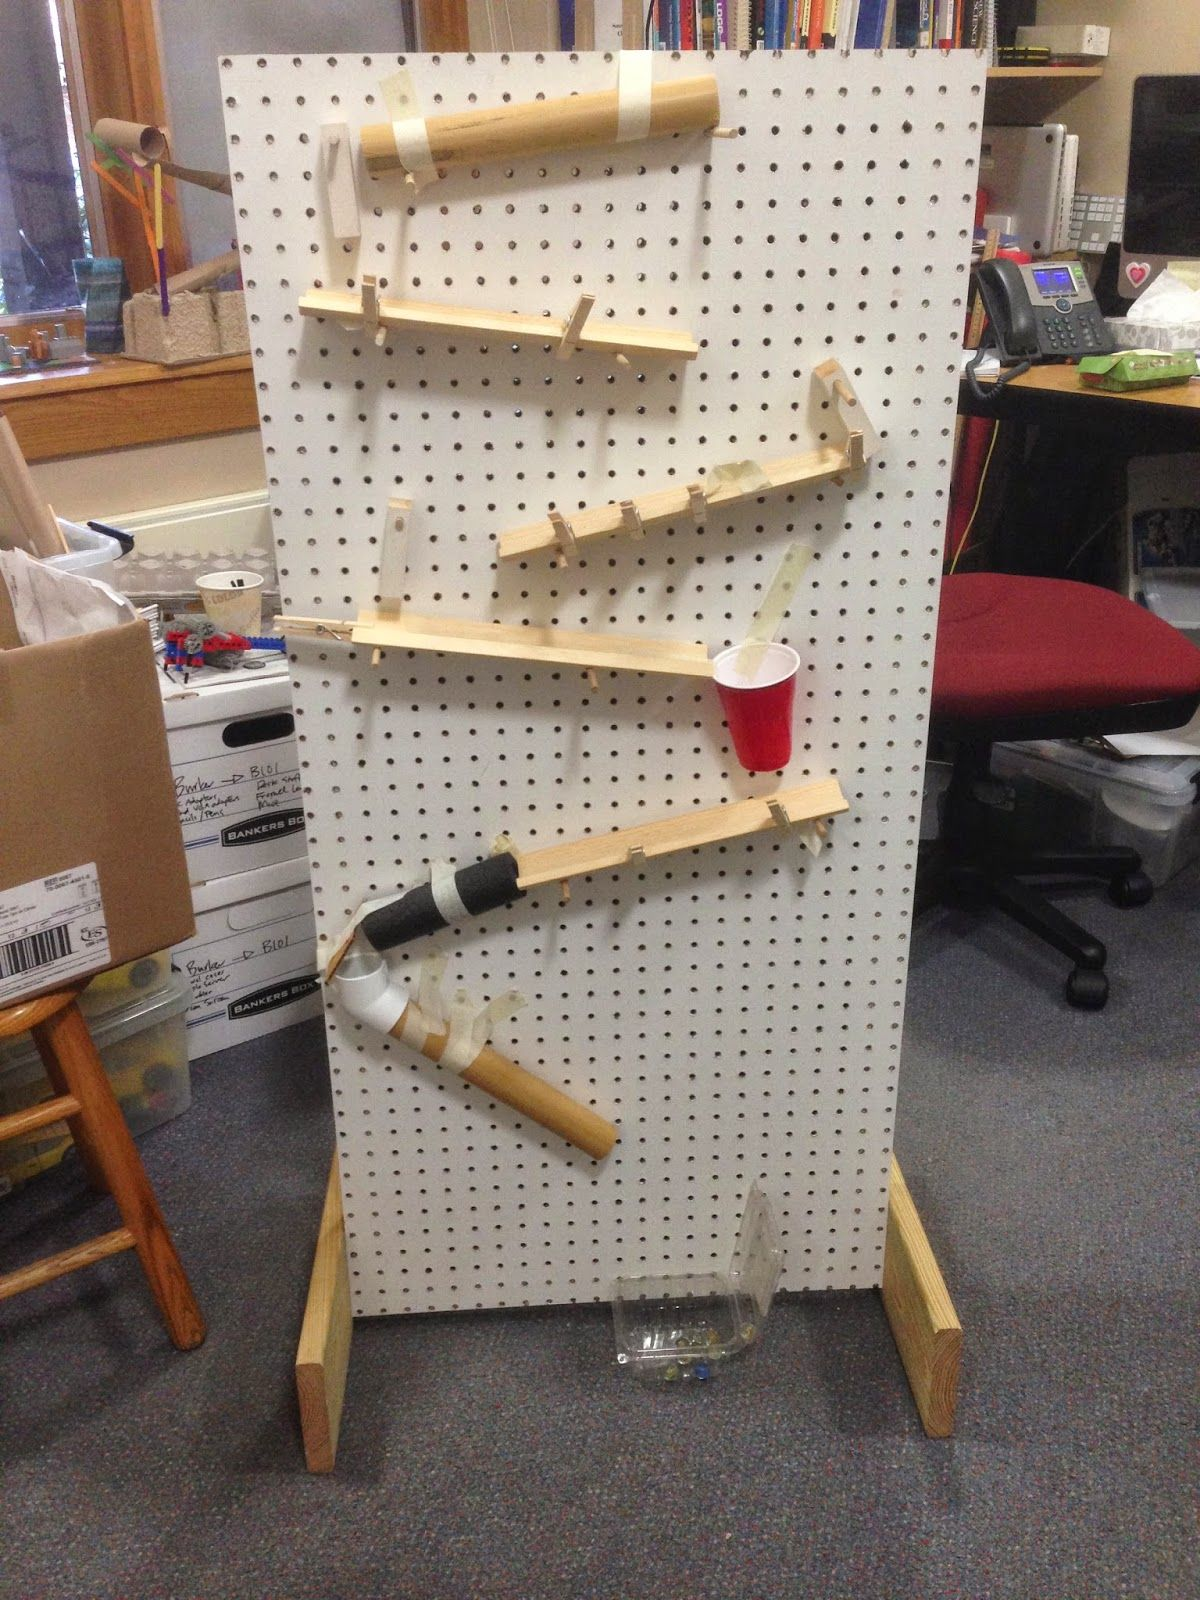 Constructing Cardboard Automata